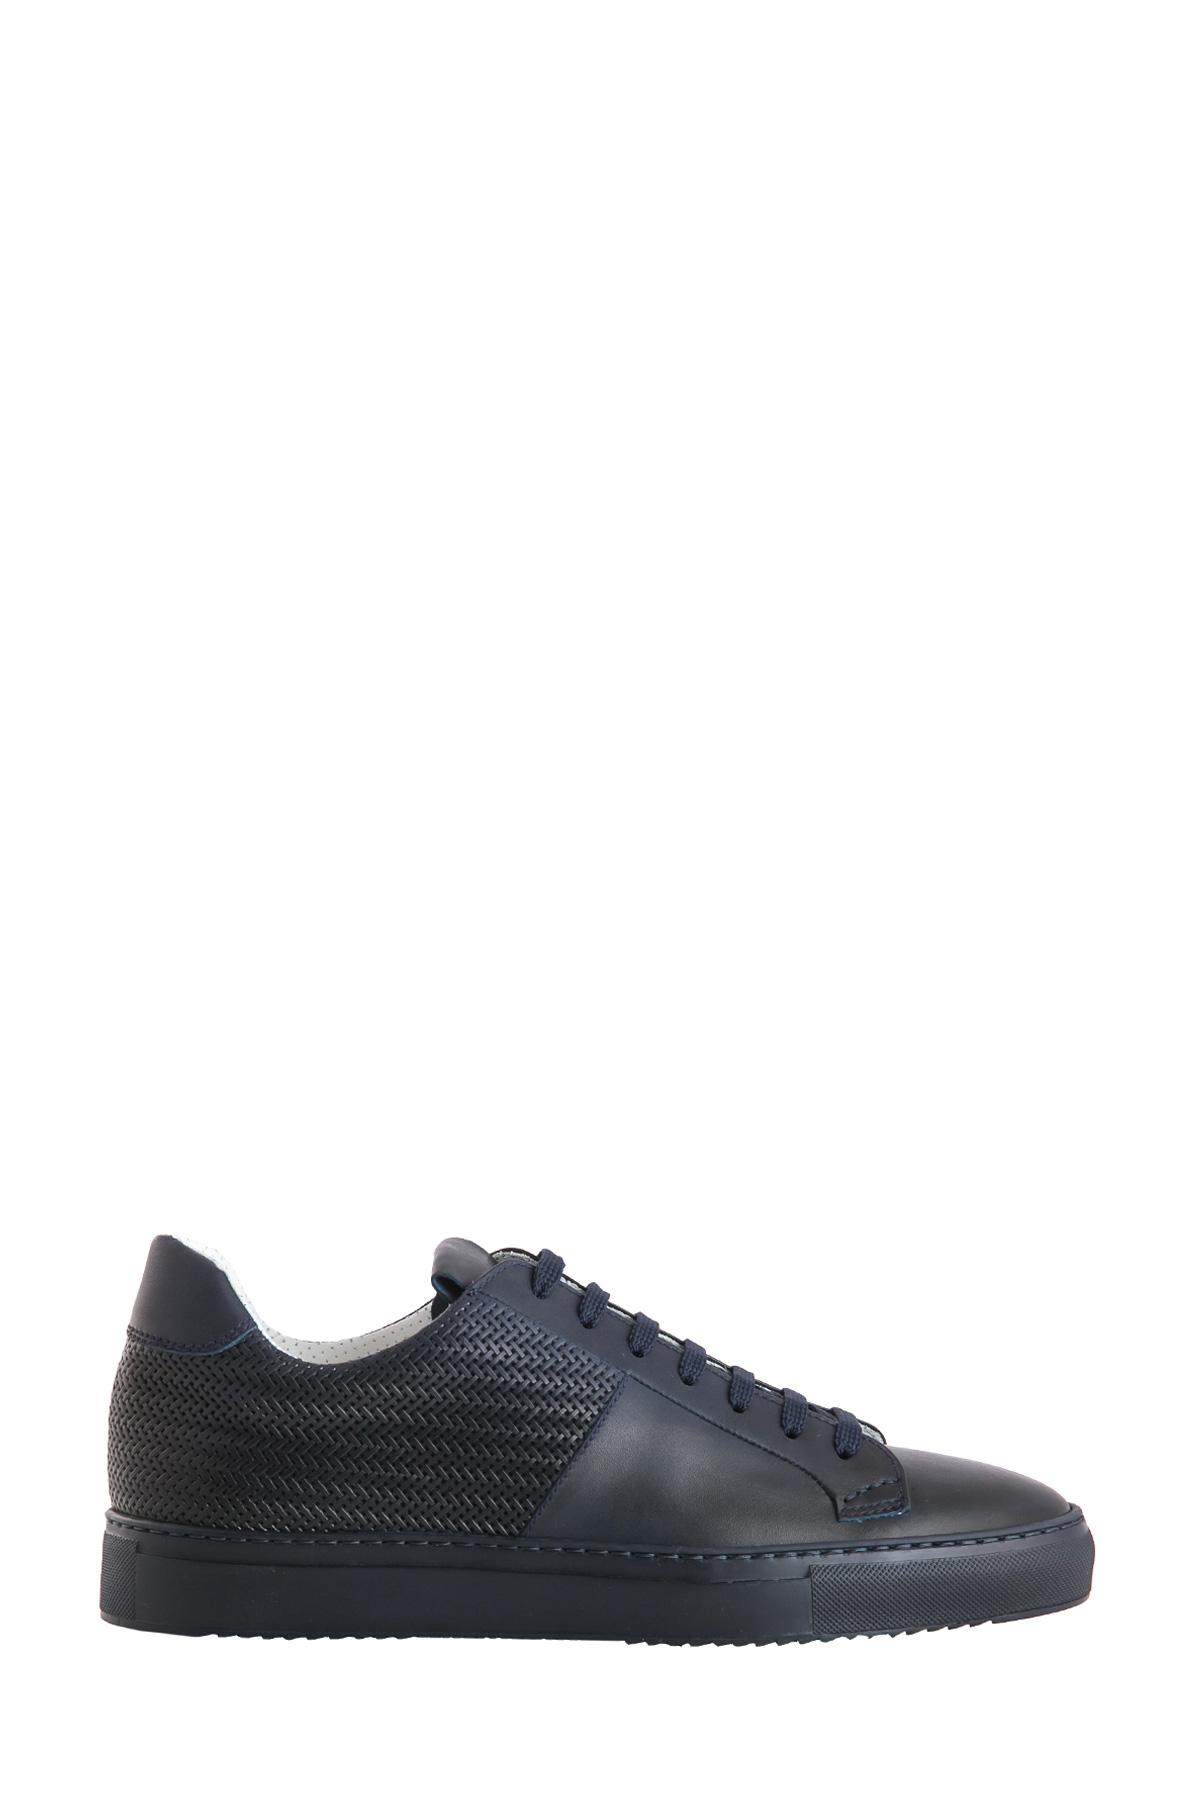 BLU SNEAKER WITH WOVEN LEATHER PANELS DUCA DI WELLS   Sneakers   NU2448ERICUF043BB00BLU